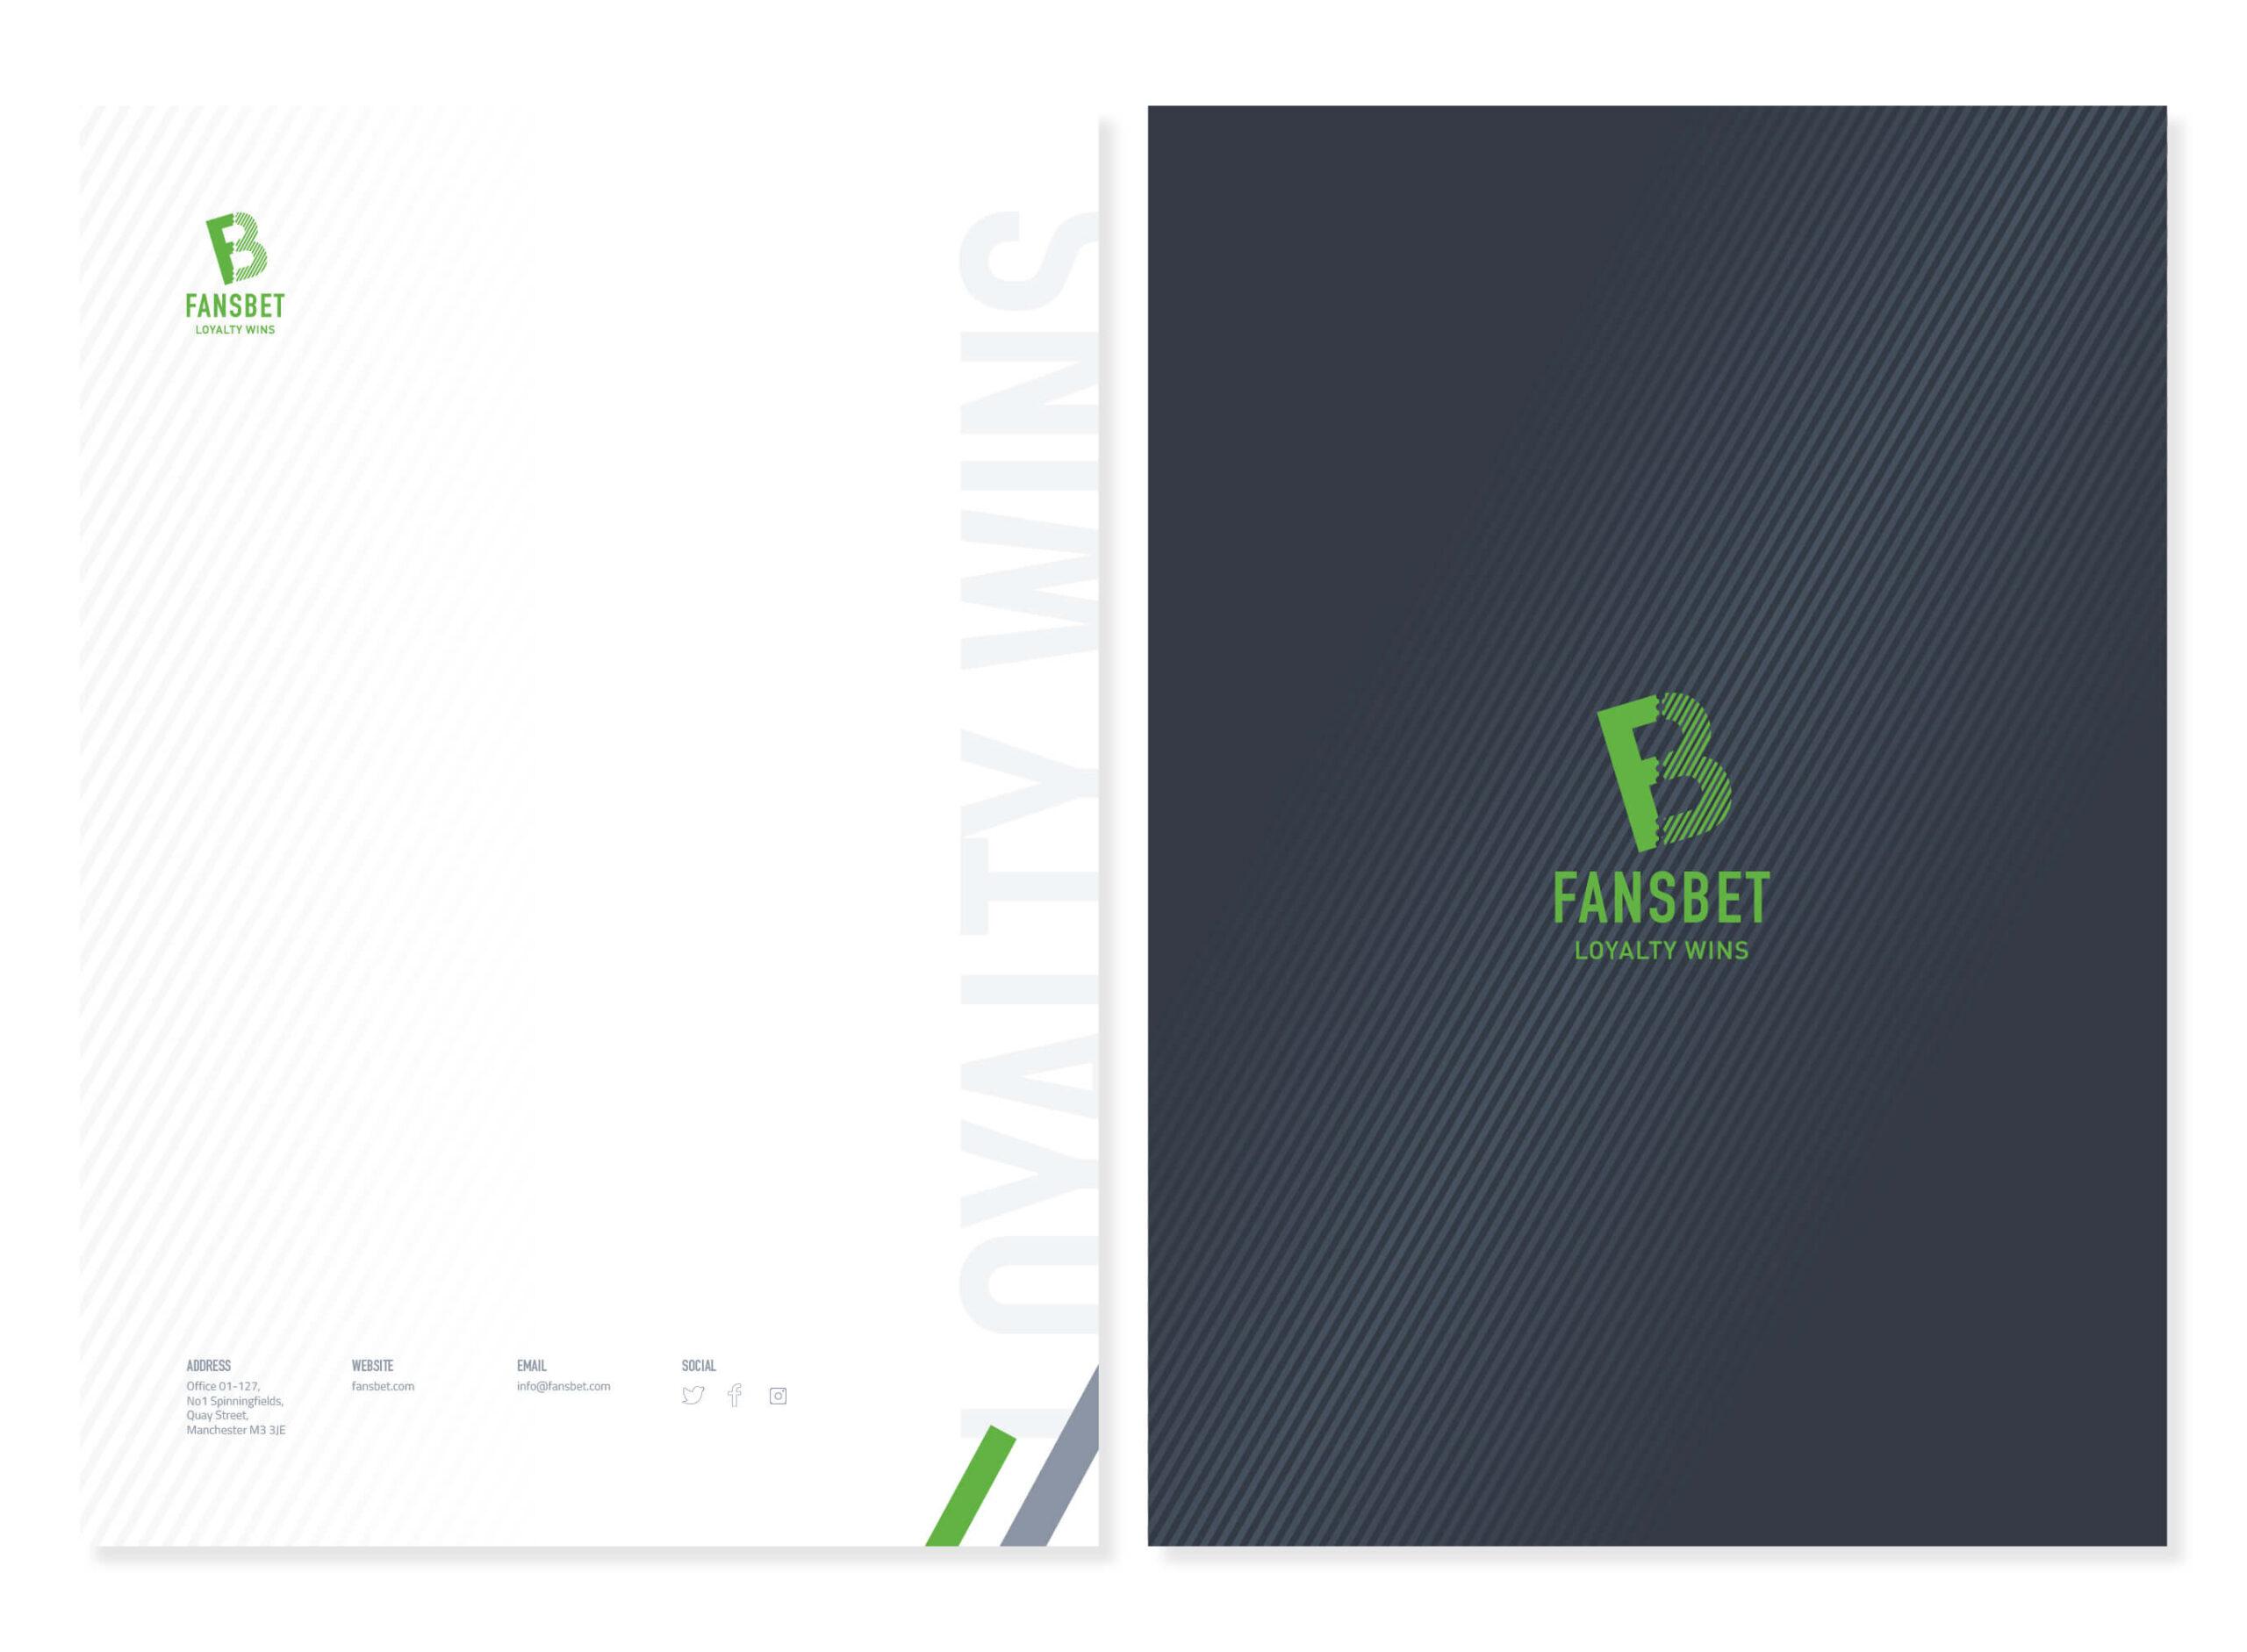 fansbet letterhead design